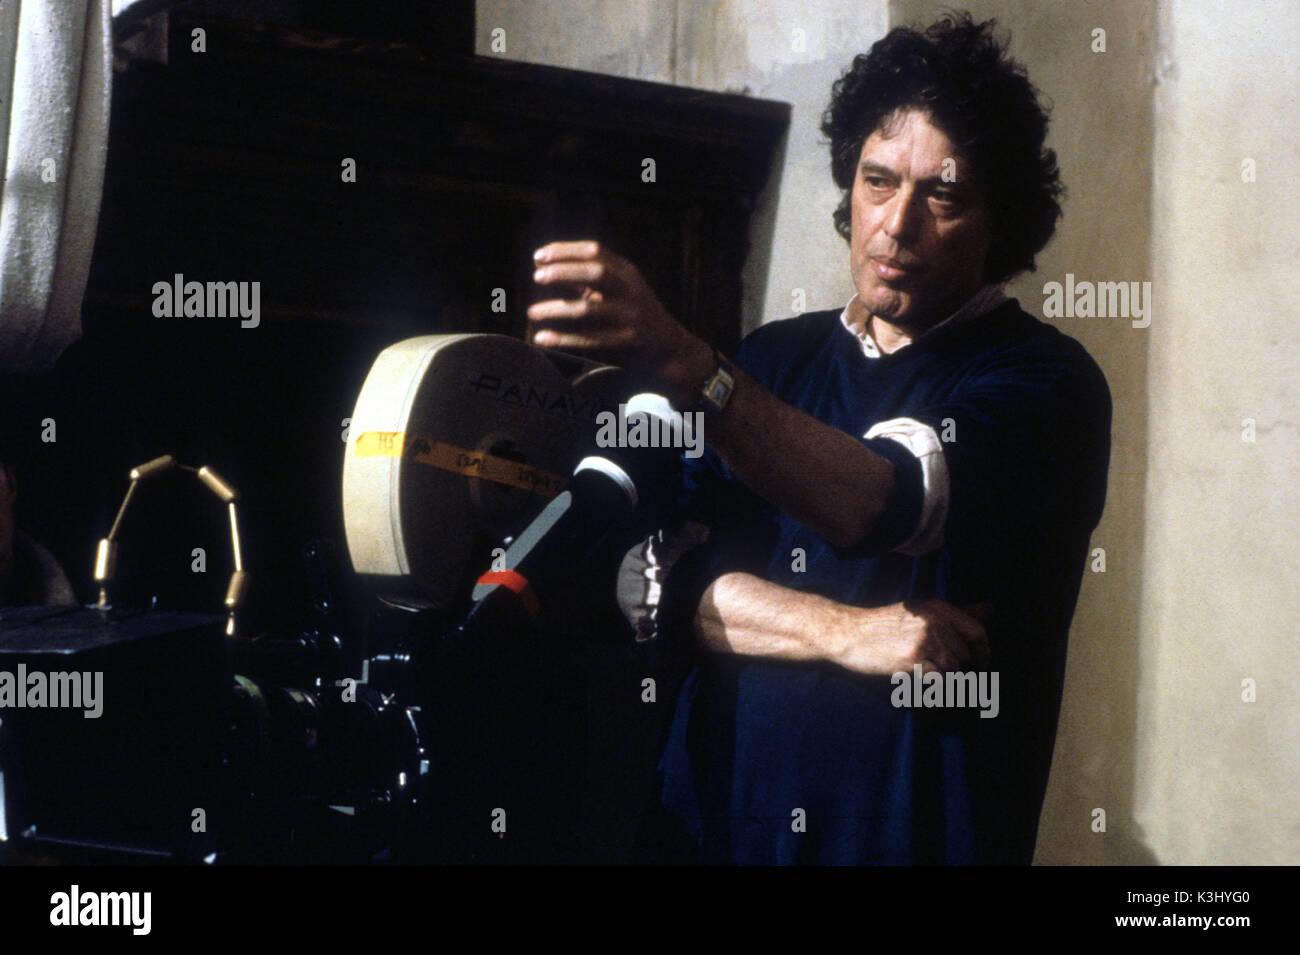 ROSENCRANTZ AND GUILDENSTERN ARE DEAD Director / Writer TOM STOPPARD     Date: 1990 - Stock Image